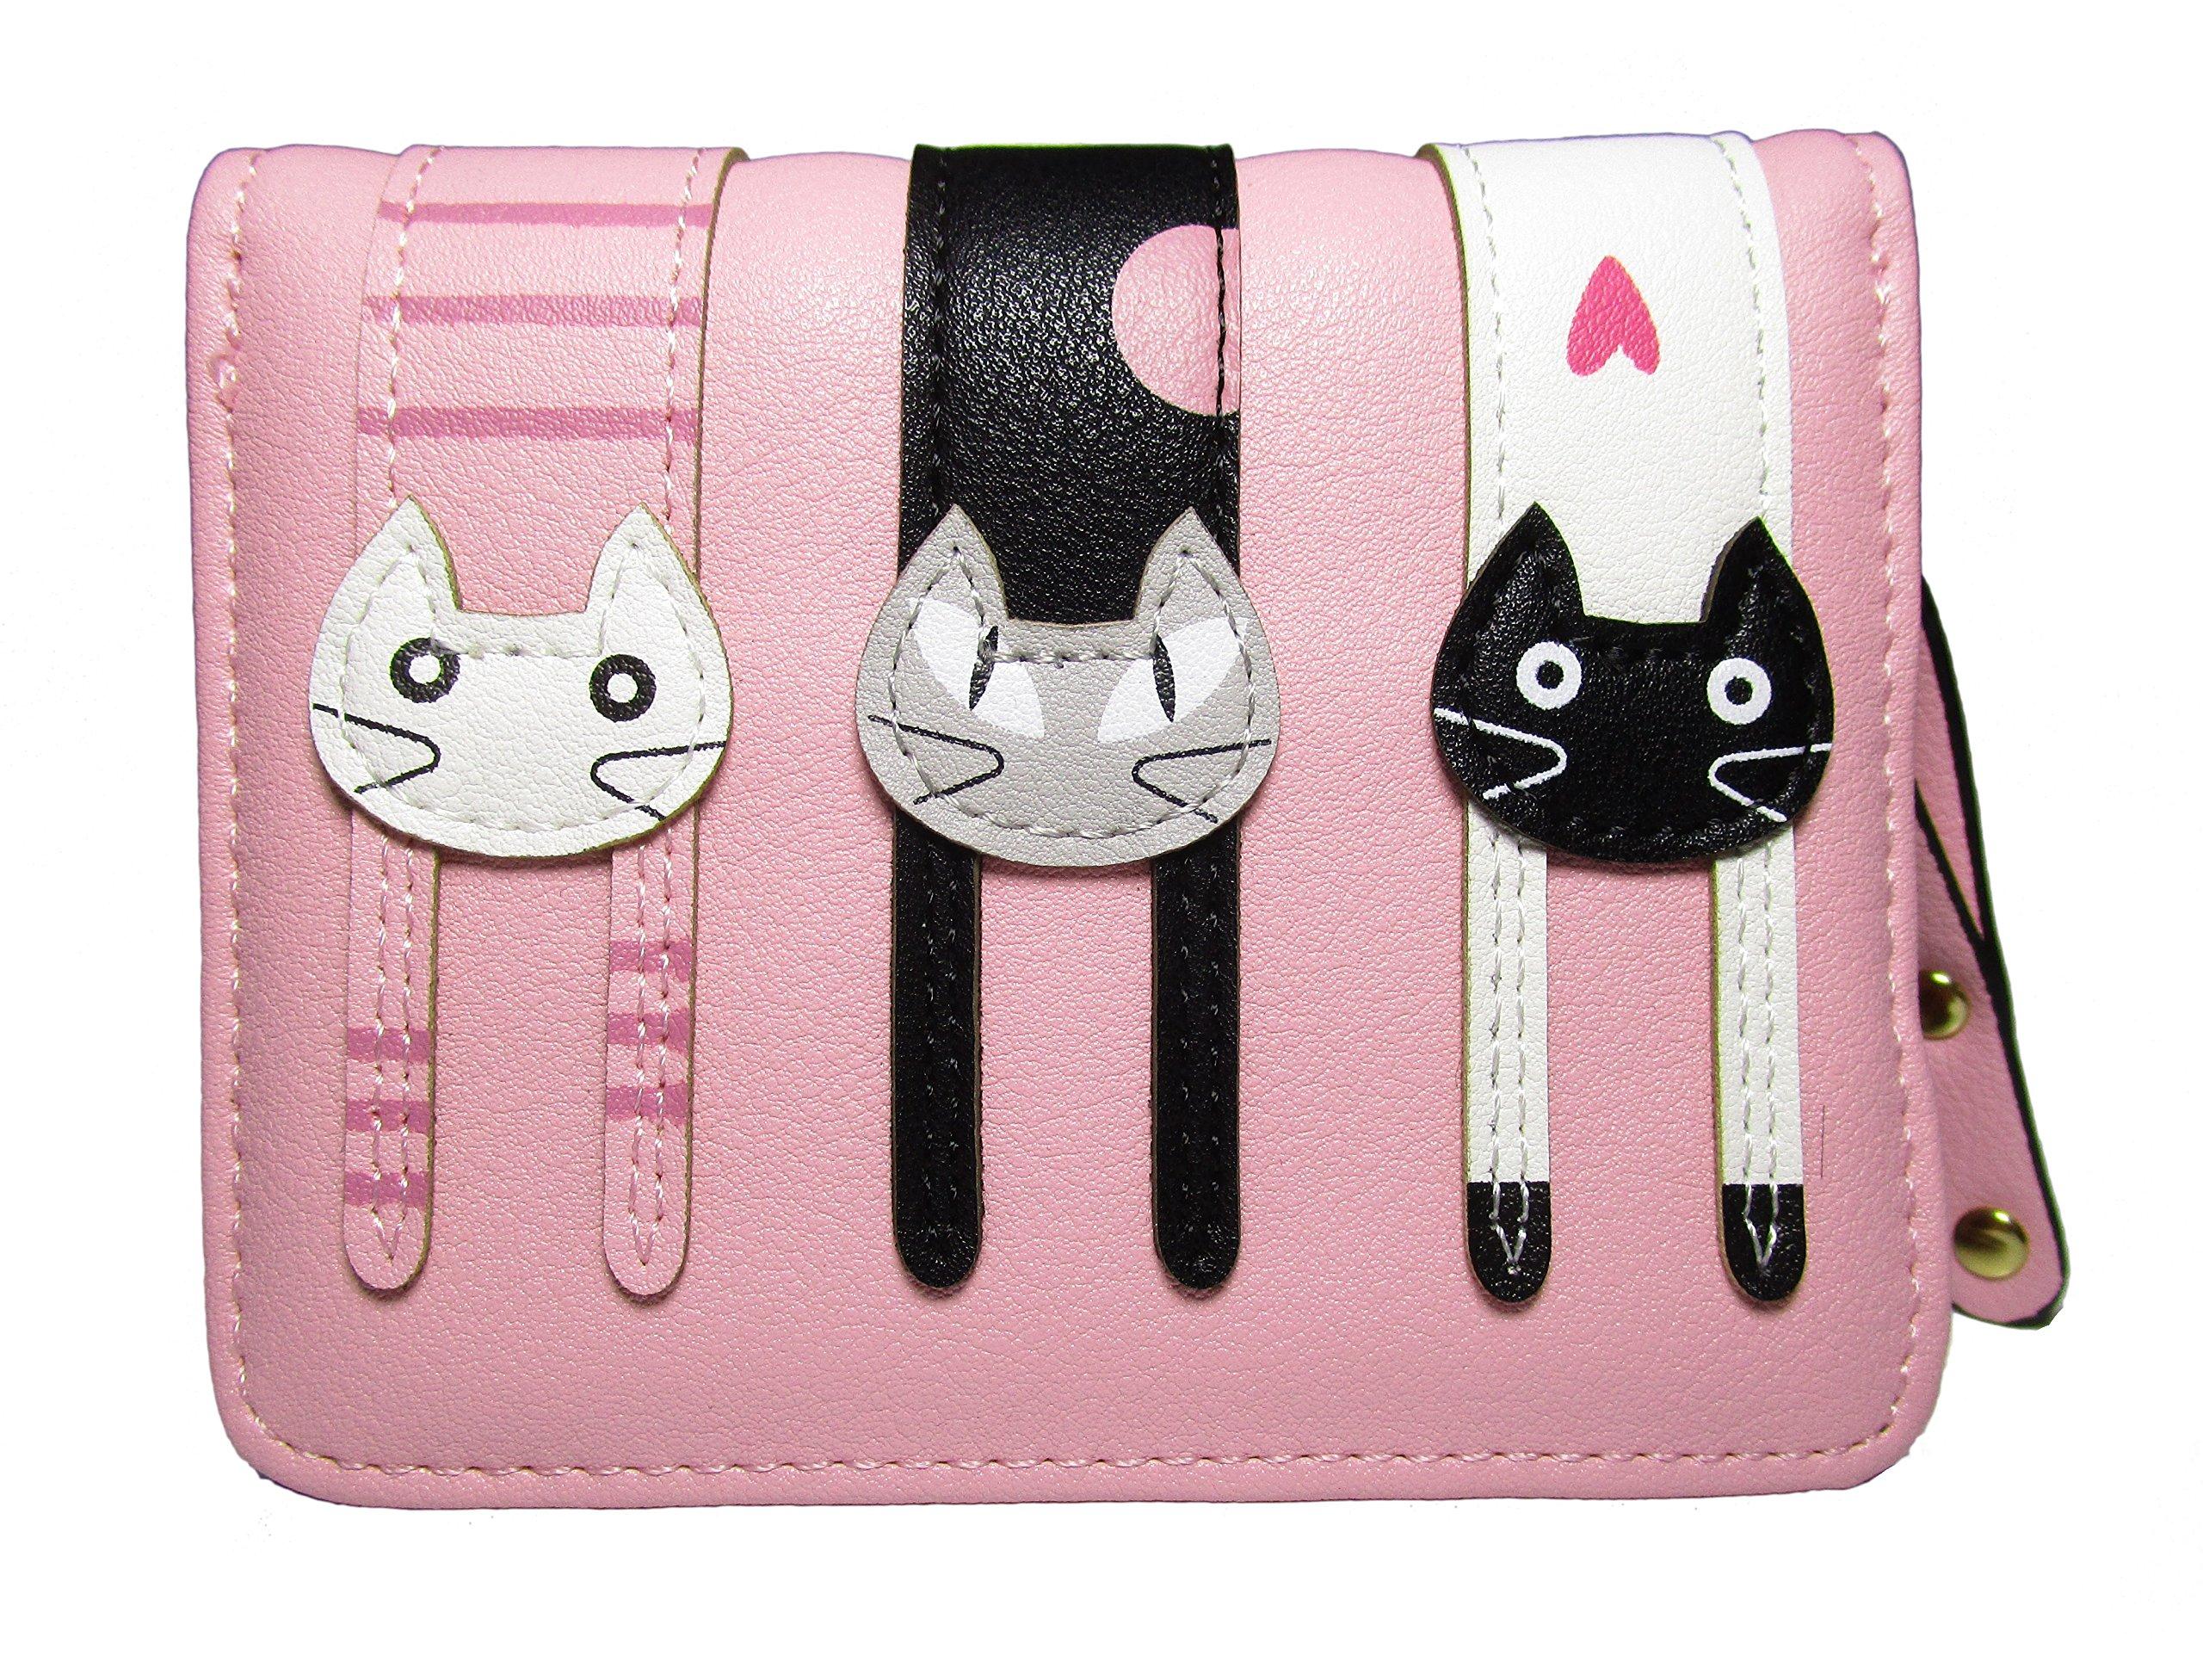 Nawoshow Women Cute Cat Wallet Coin Purse Bifold Wallet Clutch Bag(Pink)